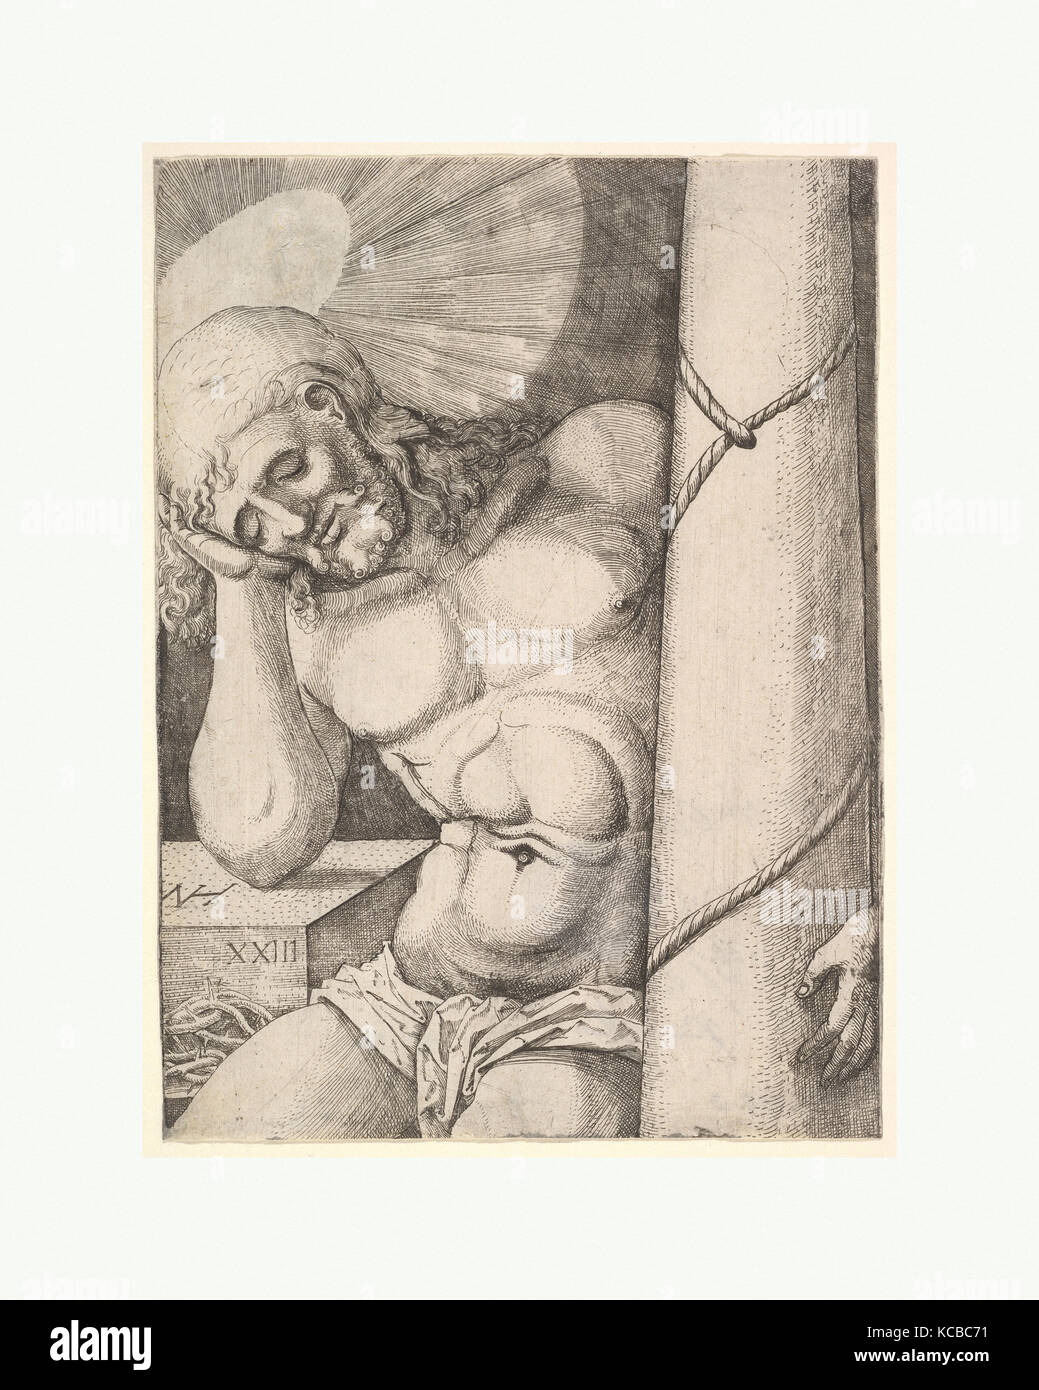 The Man of Sorrows at the Column, Nikolaus Hogenberg, 1523 - Stock Image